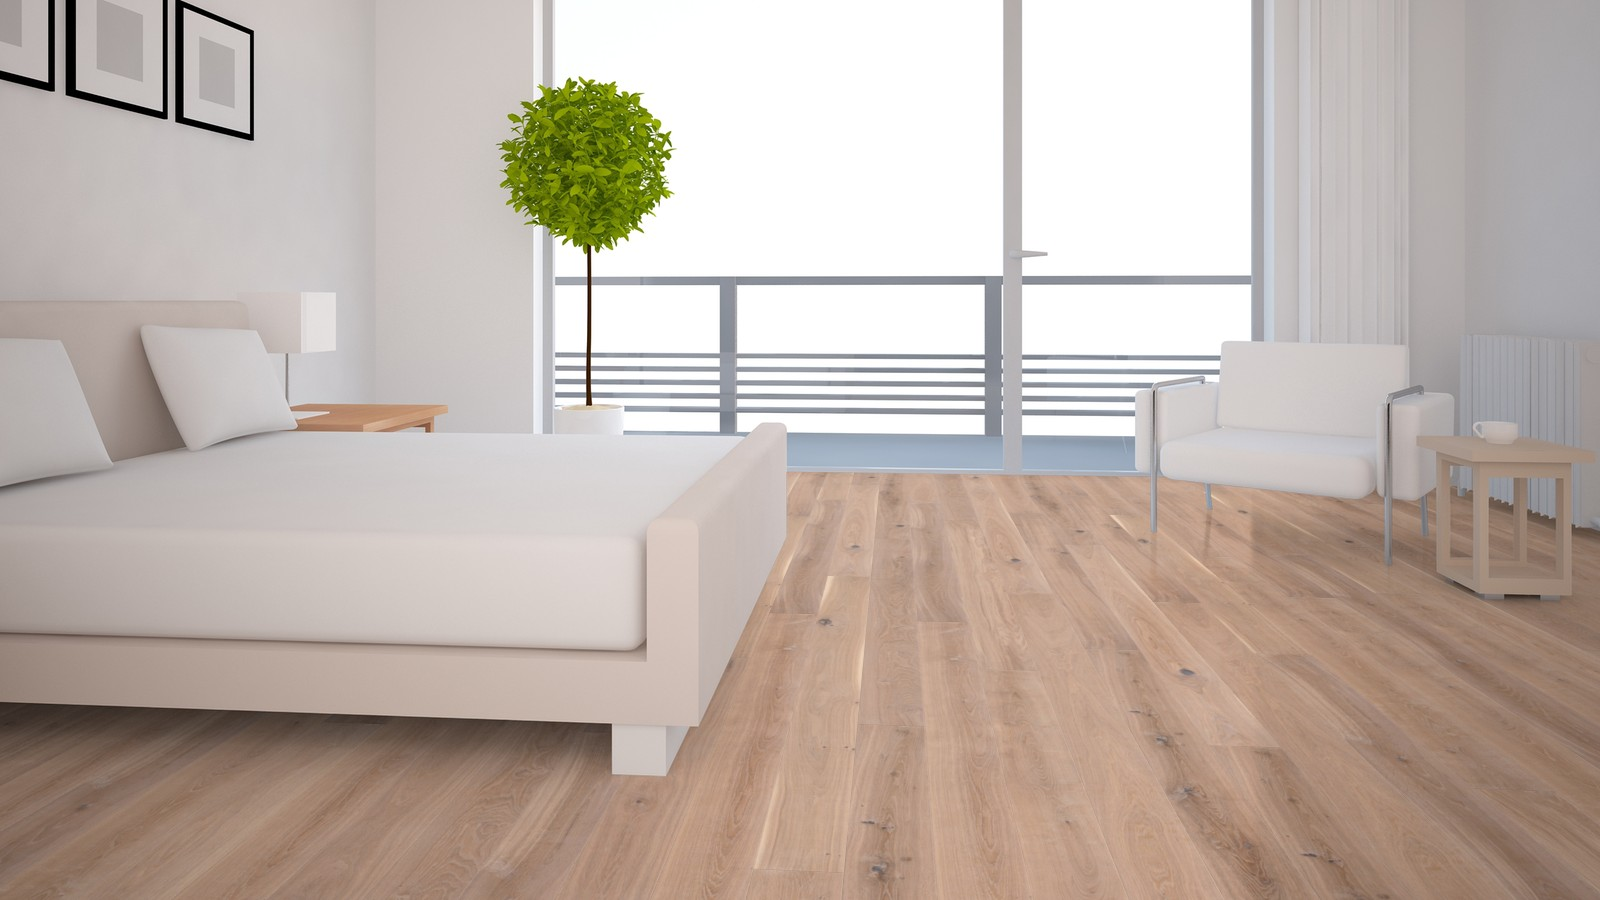 ter h rne bright collection l parkett l b10 eiche sanftbeige l landhausdiele preisbrecher. Black Bedroom Furniture Sets. Home Design Ideas